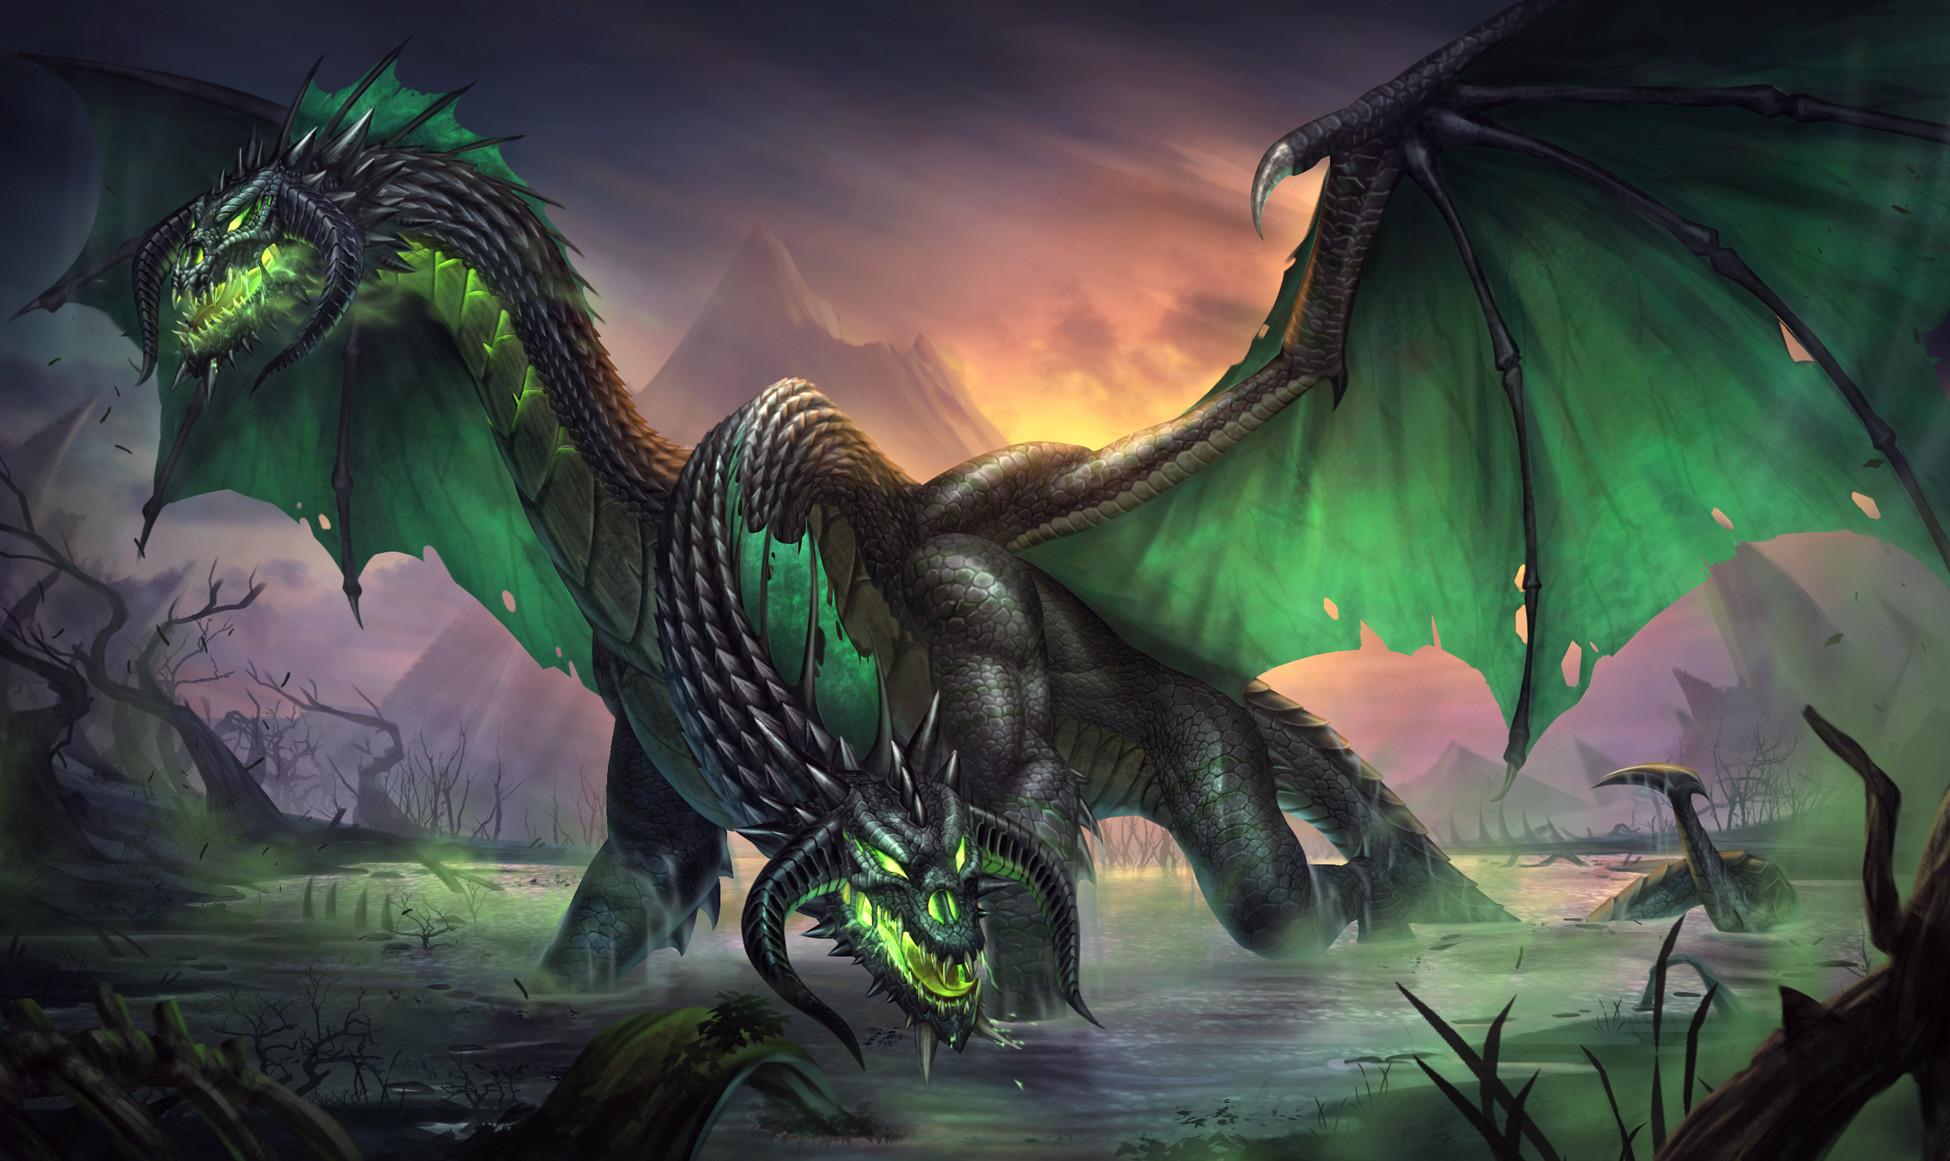 Two Headed Black Dragon